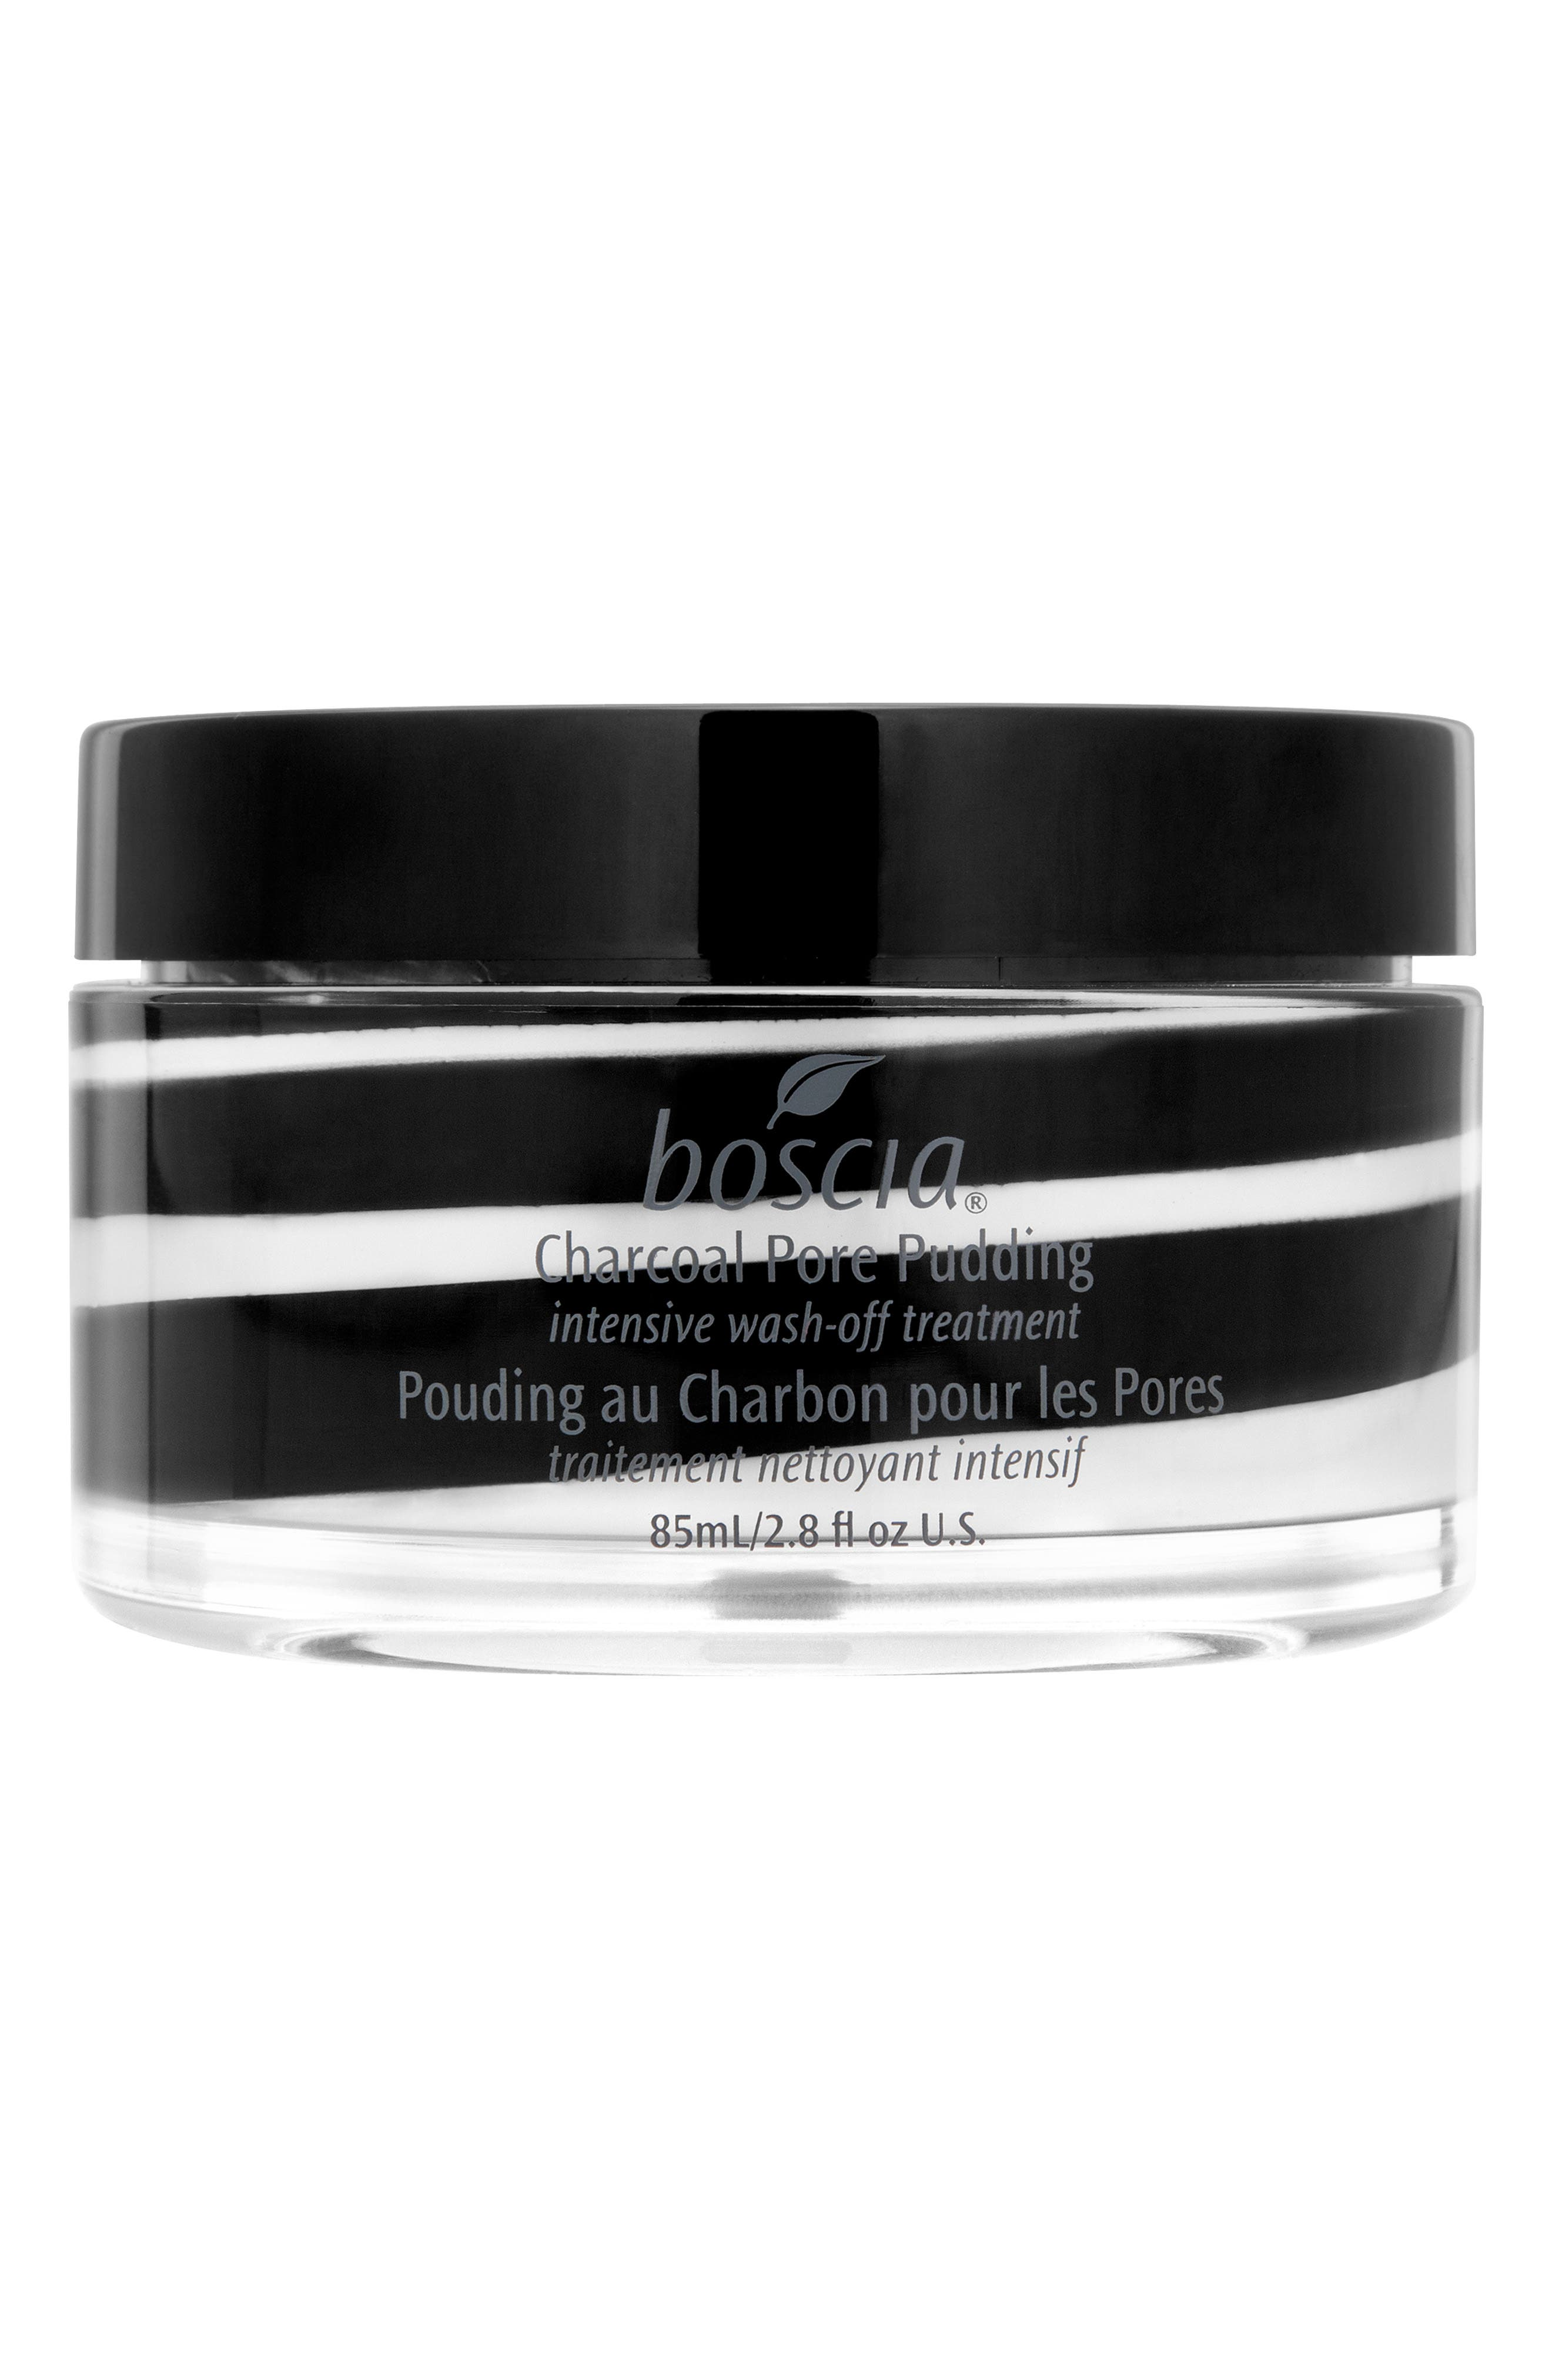 Charcoal Pore Pudding Mask